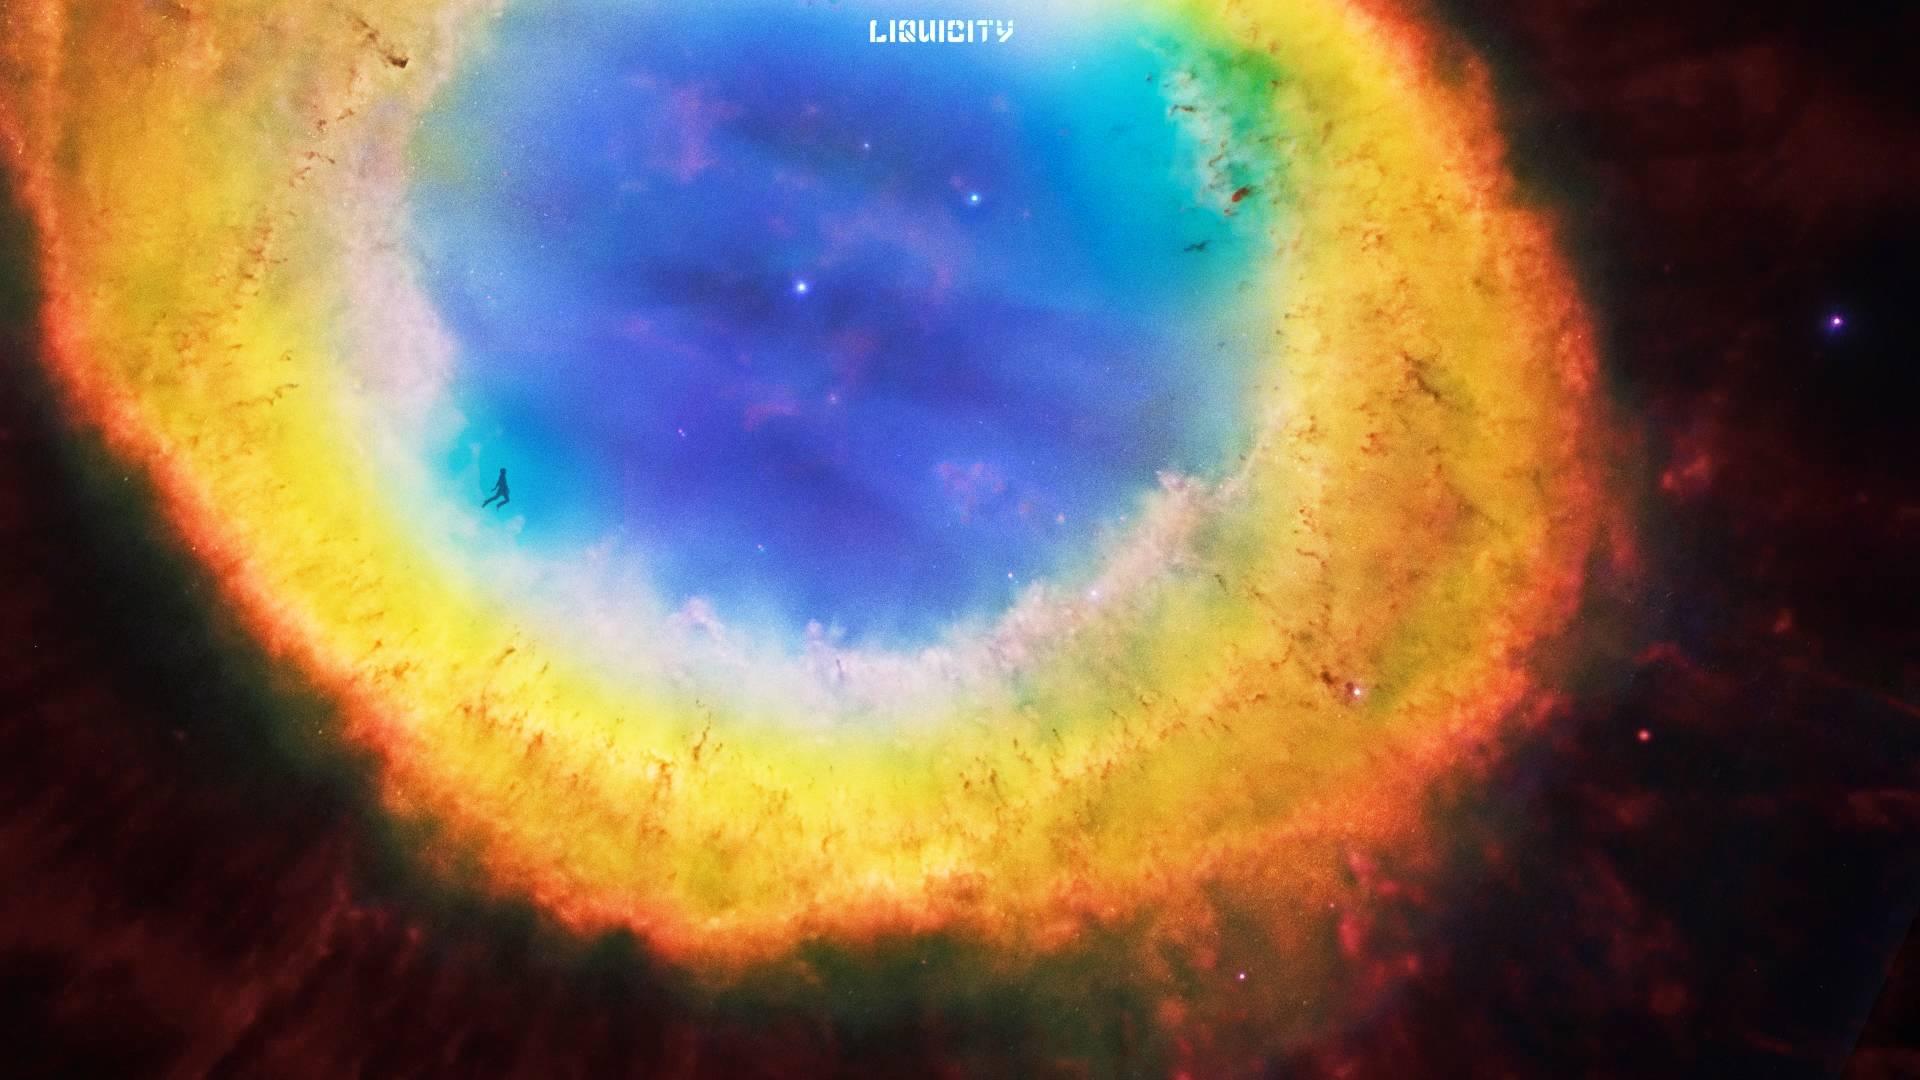 LIQUICITY HD WALLPAPER   Album on Imgur 1920x1080